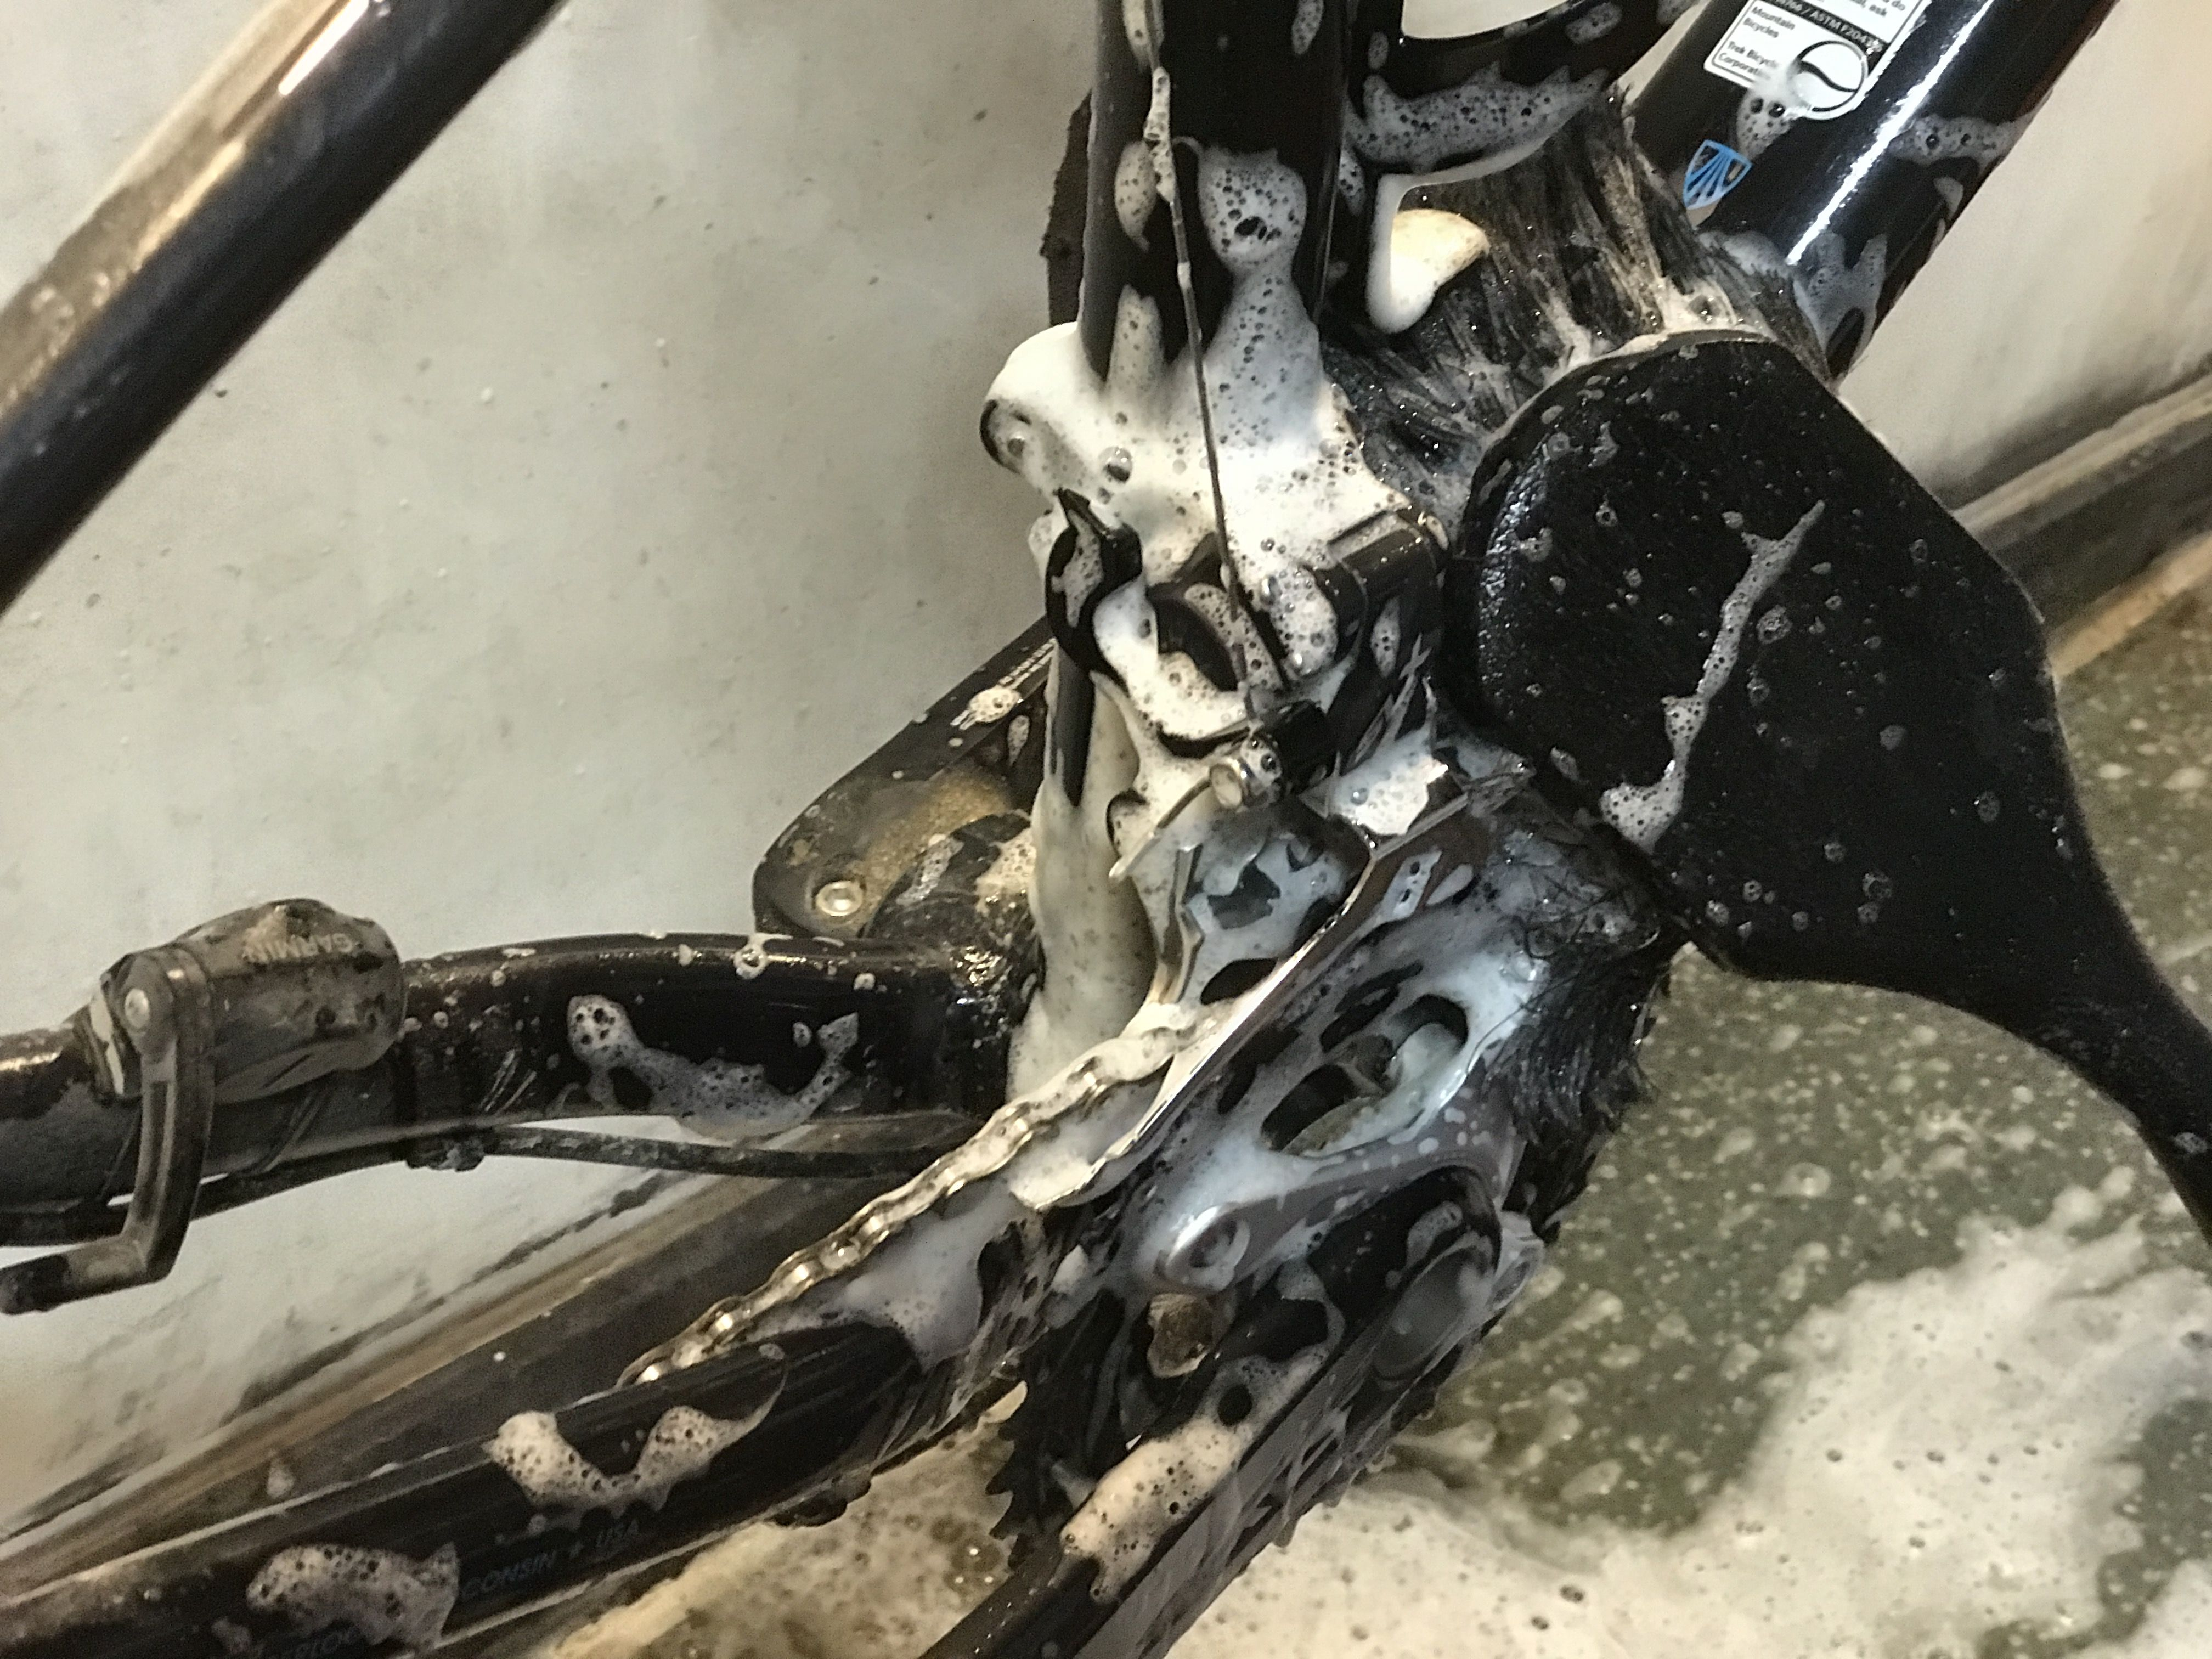 Bike mechanics image by jeff holmstrom on i love being a